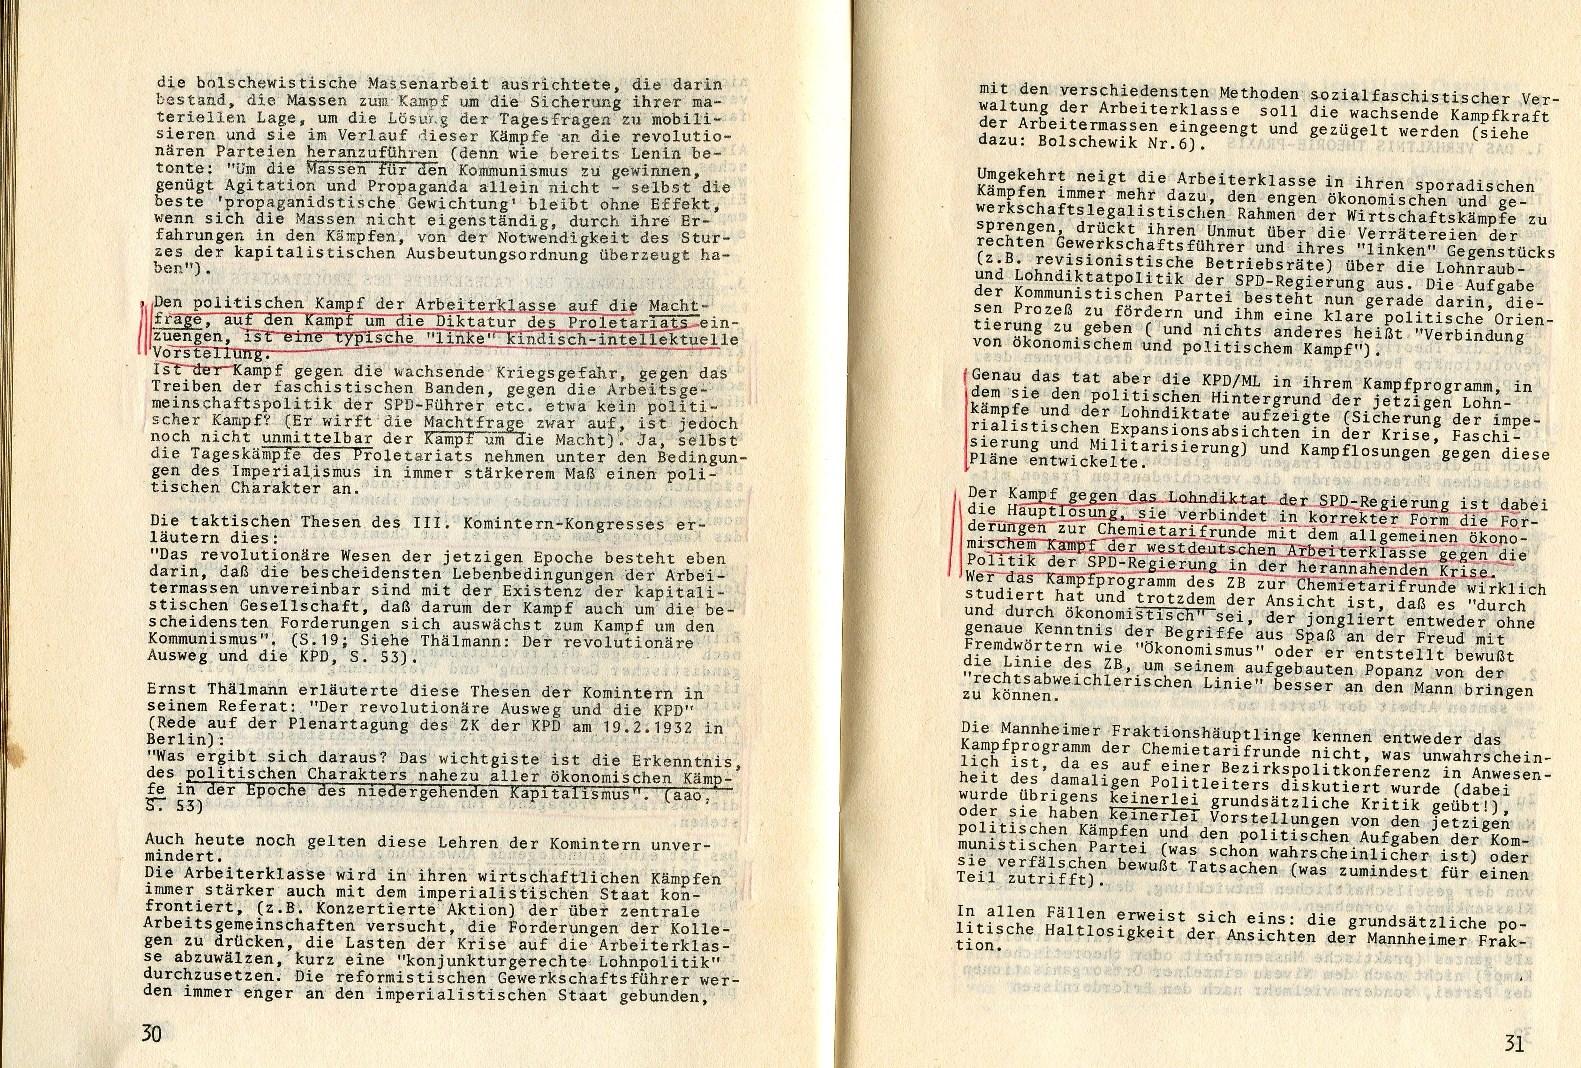 ZB_Parteiarbeiter_1971_05_17